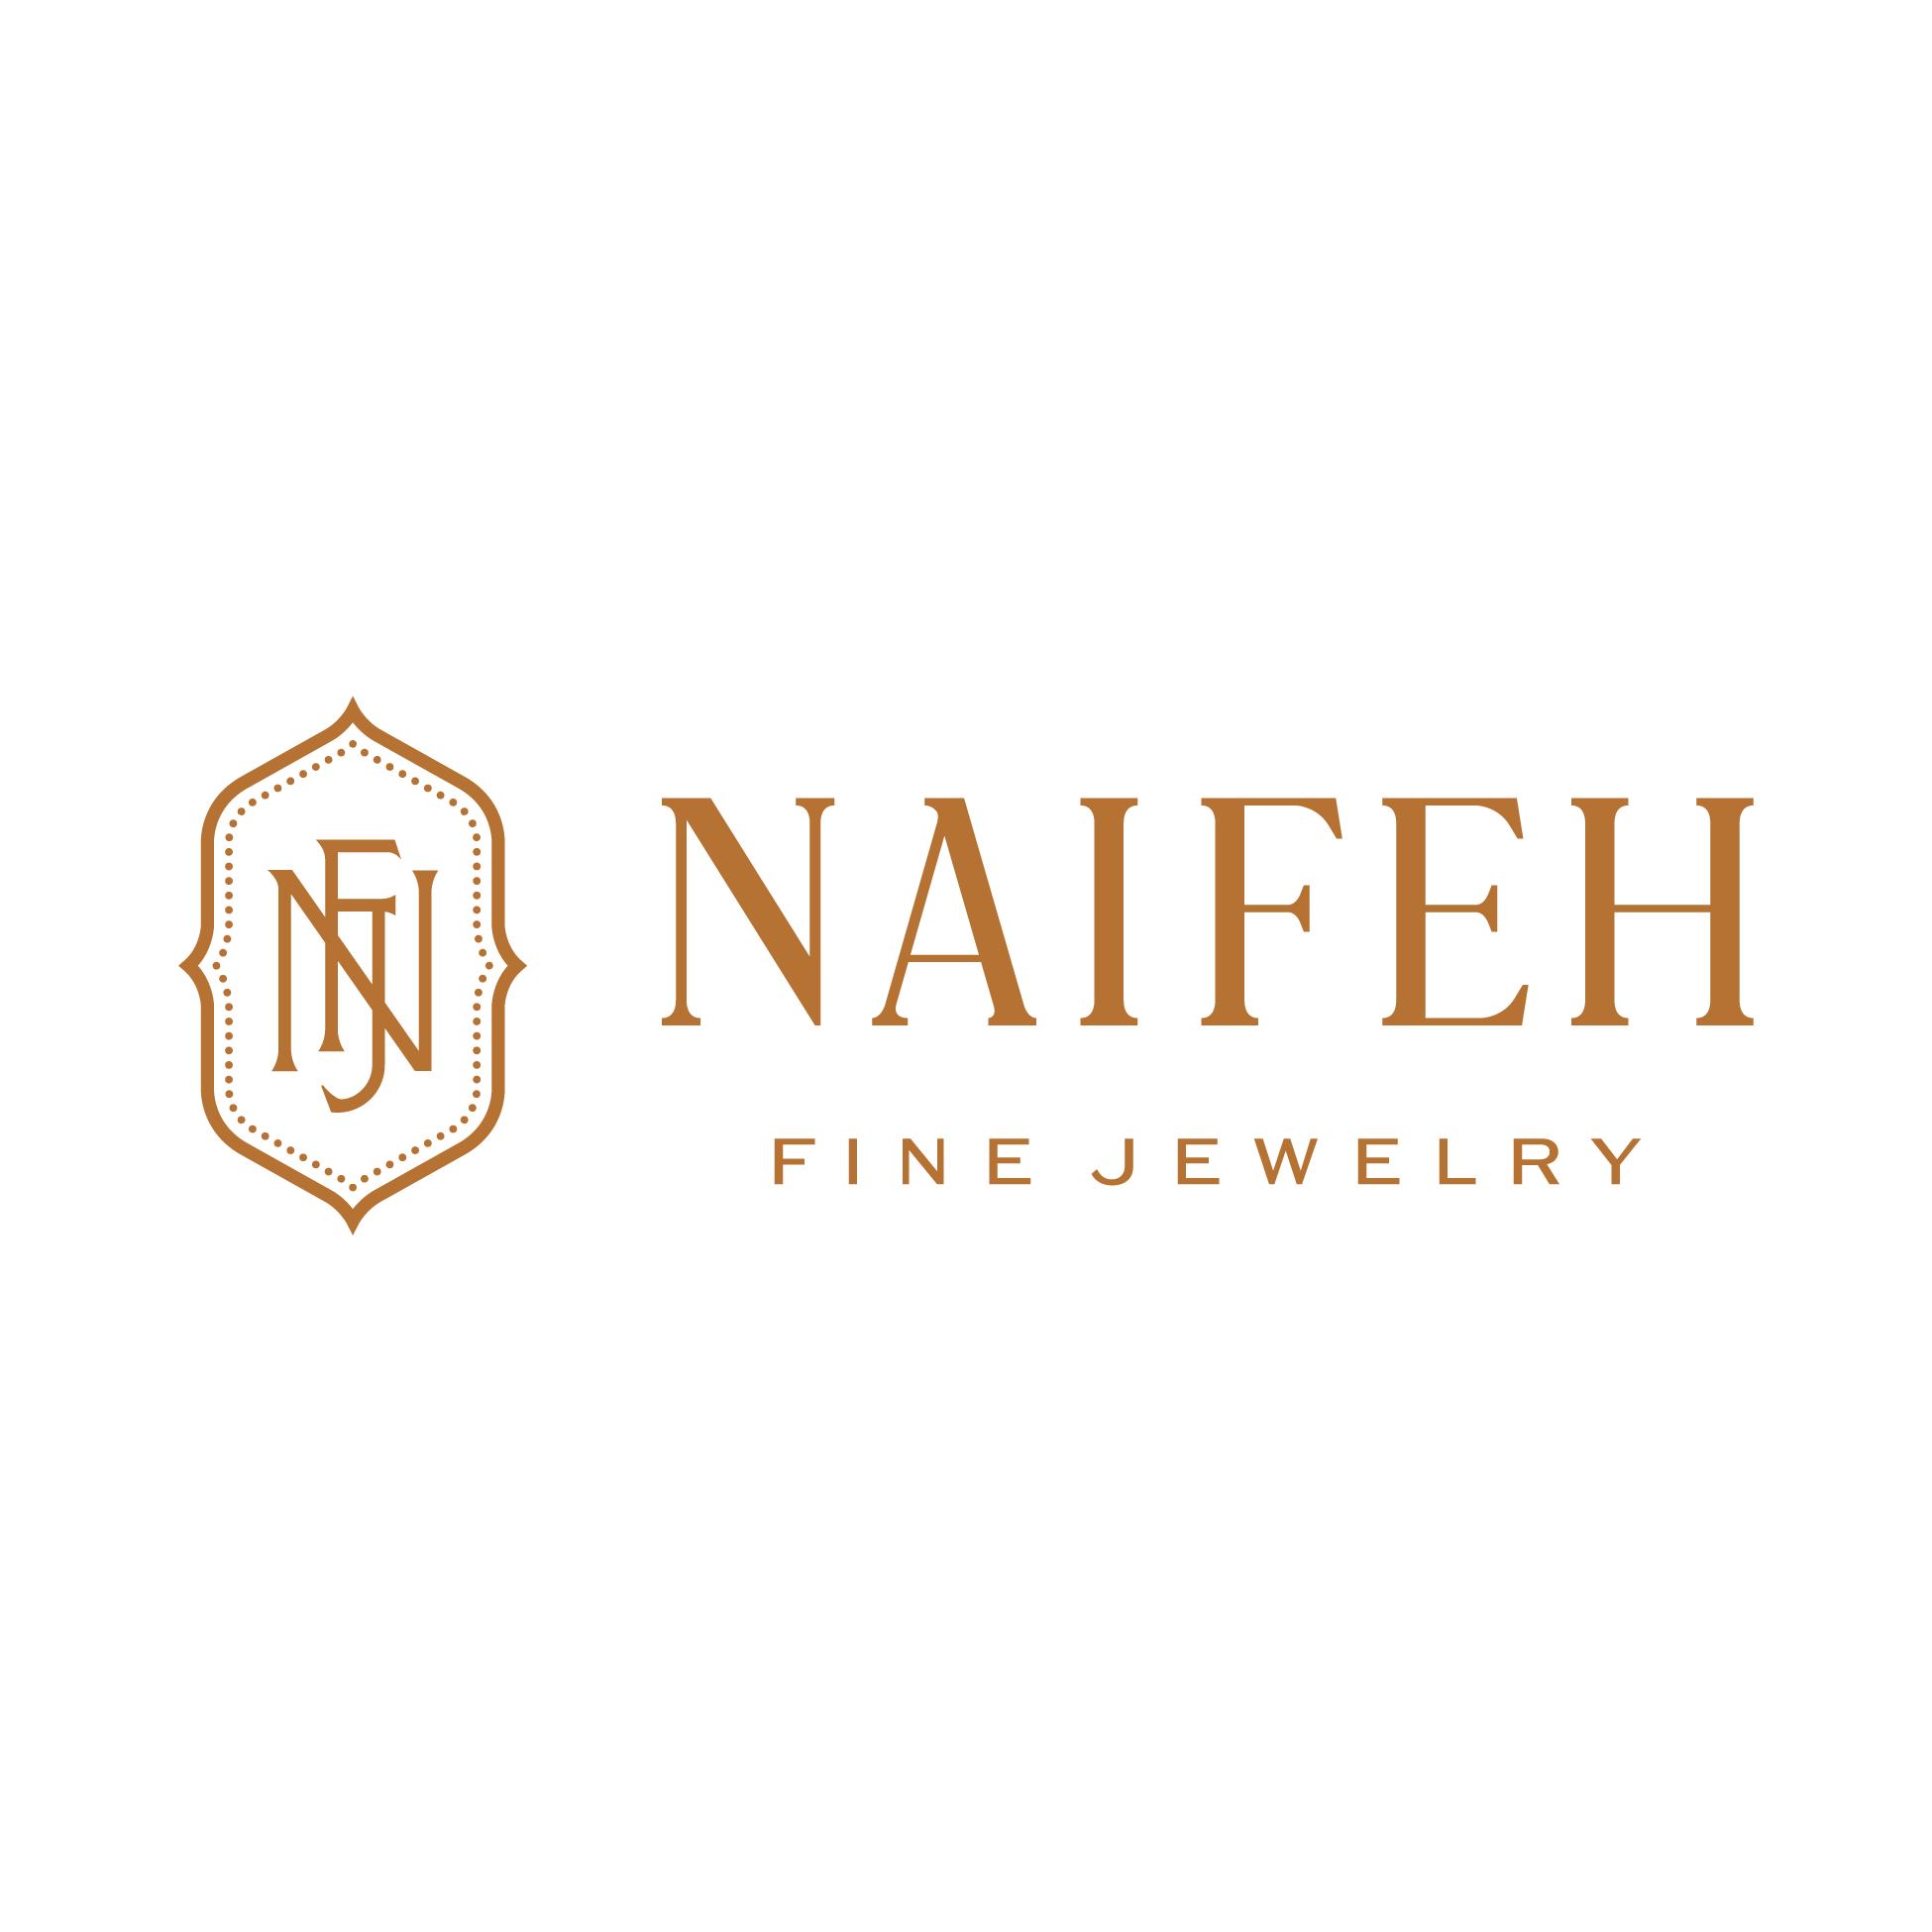 Naifeh Fine Jewelry